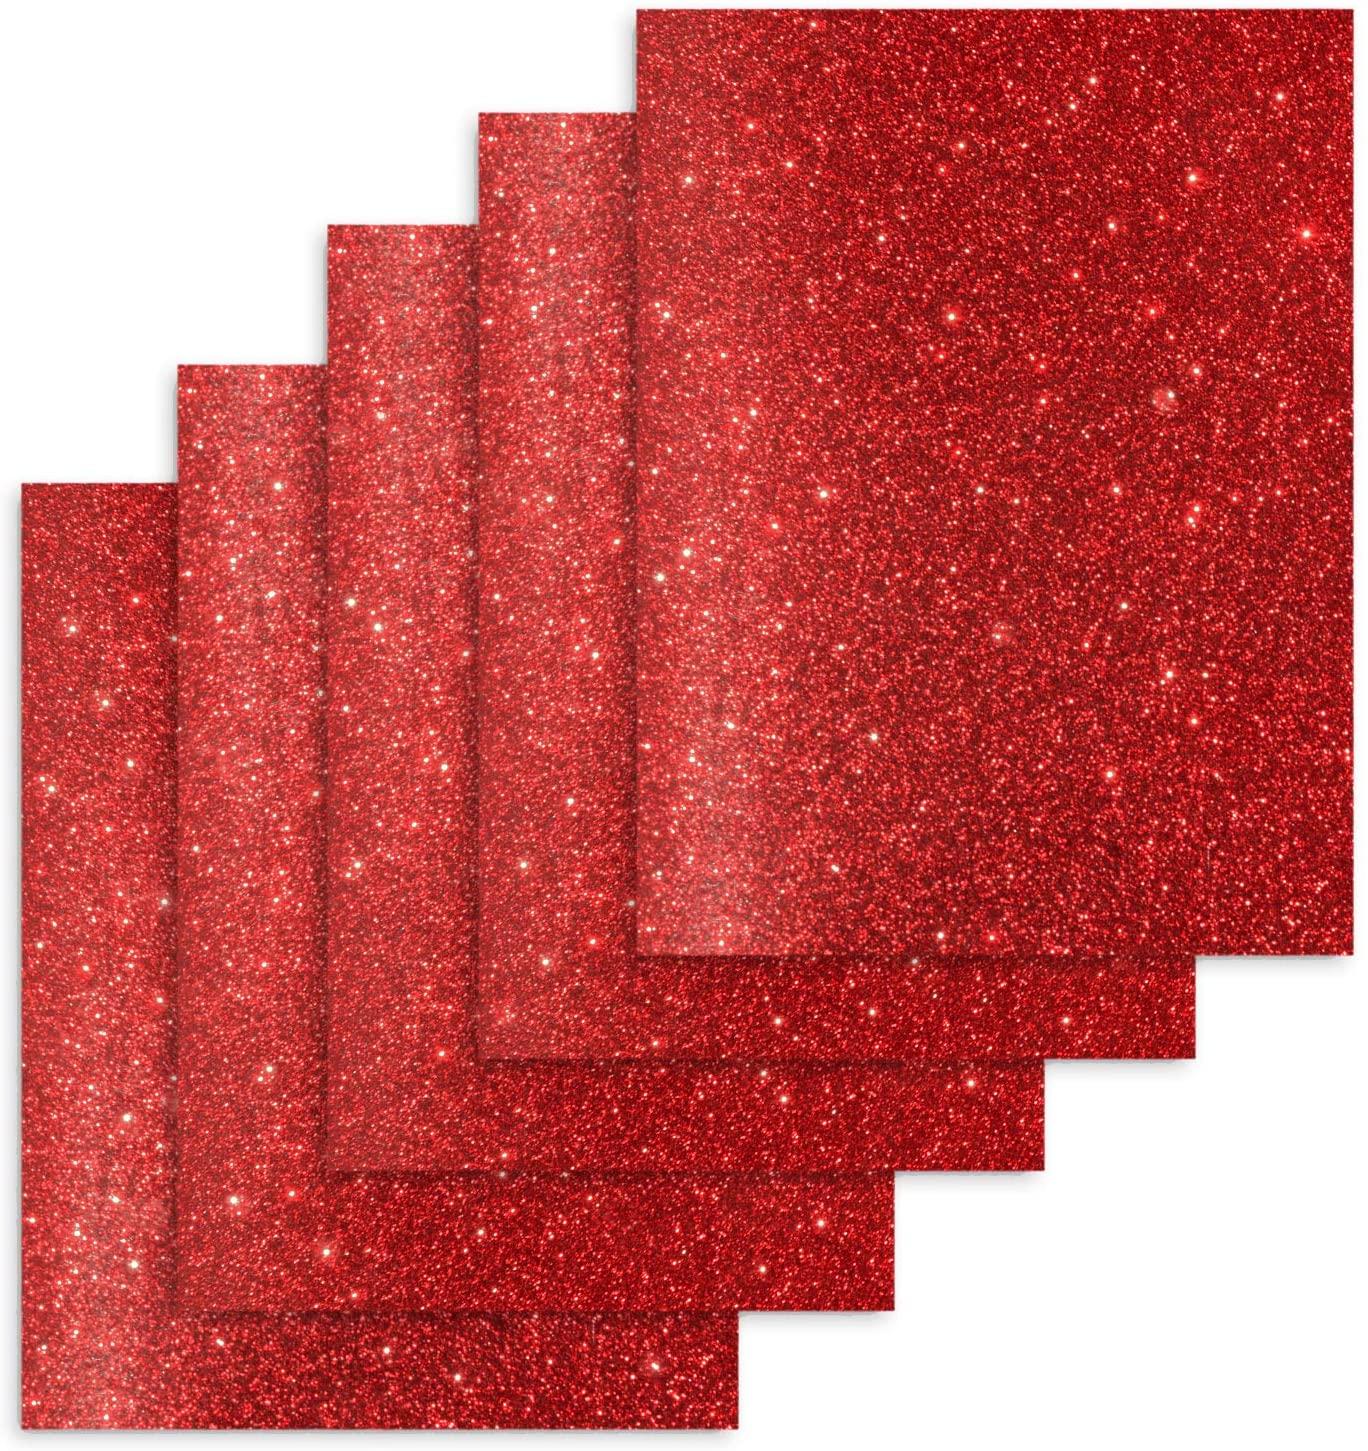 TECKWRAP Red Glitter Heat Transfer Vinyl, Glitter Red Iron on Vinyl Heat Press Vinyl for T-Shirts 12